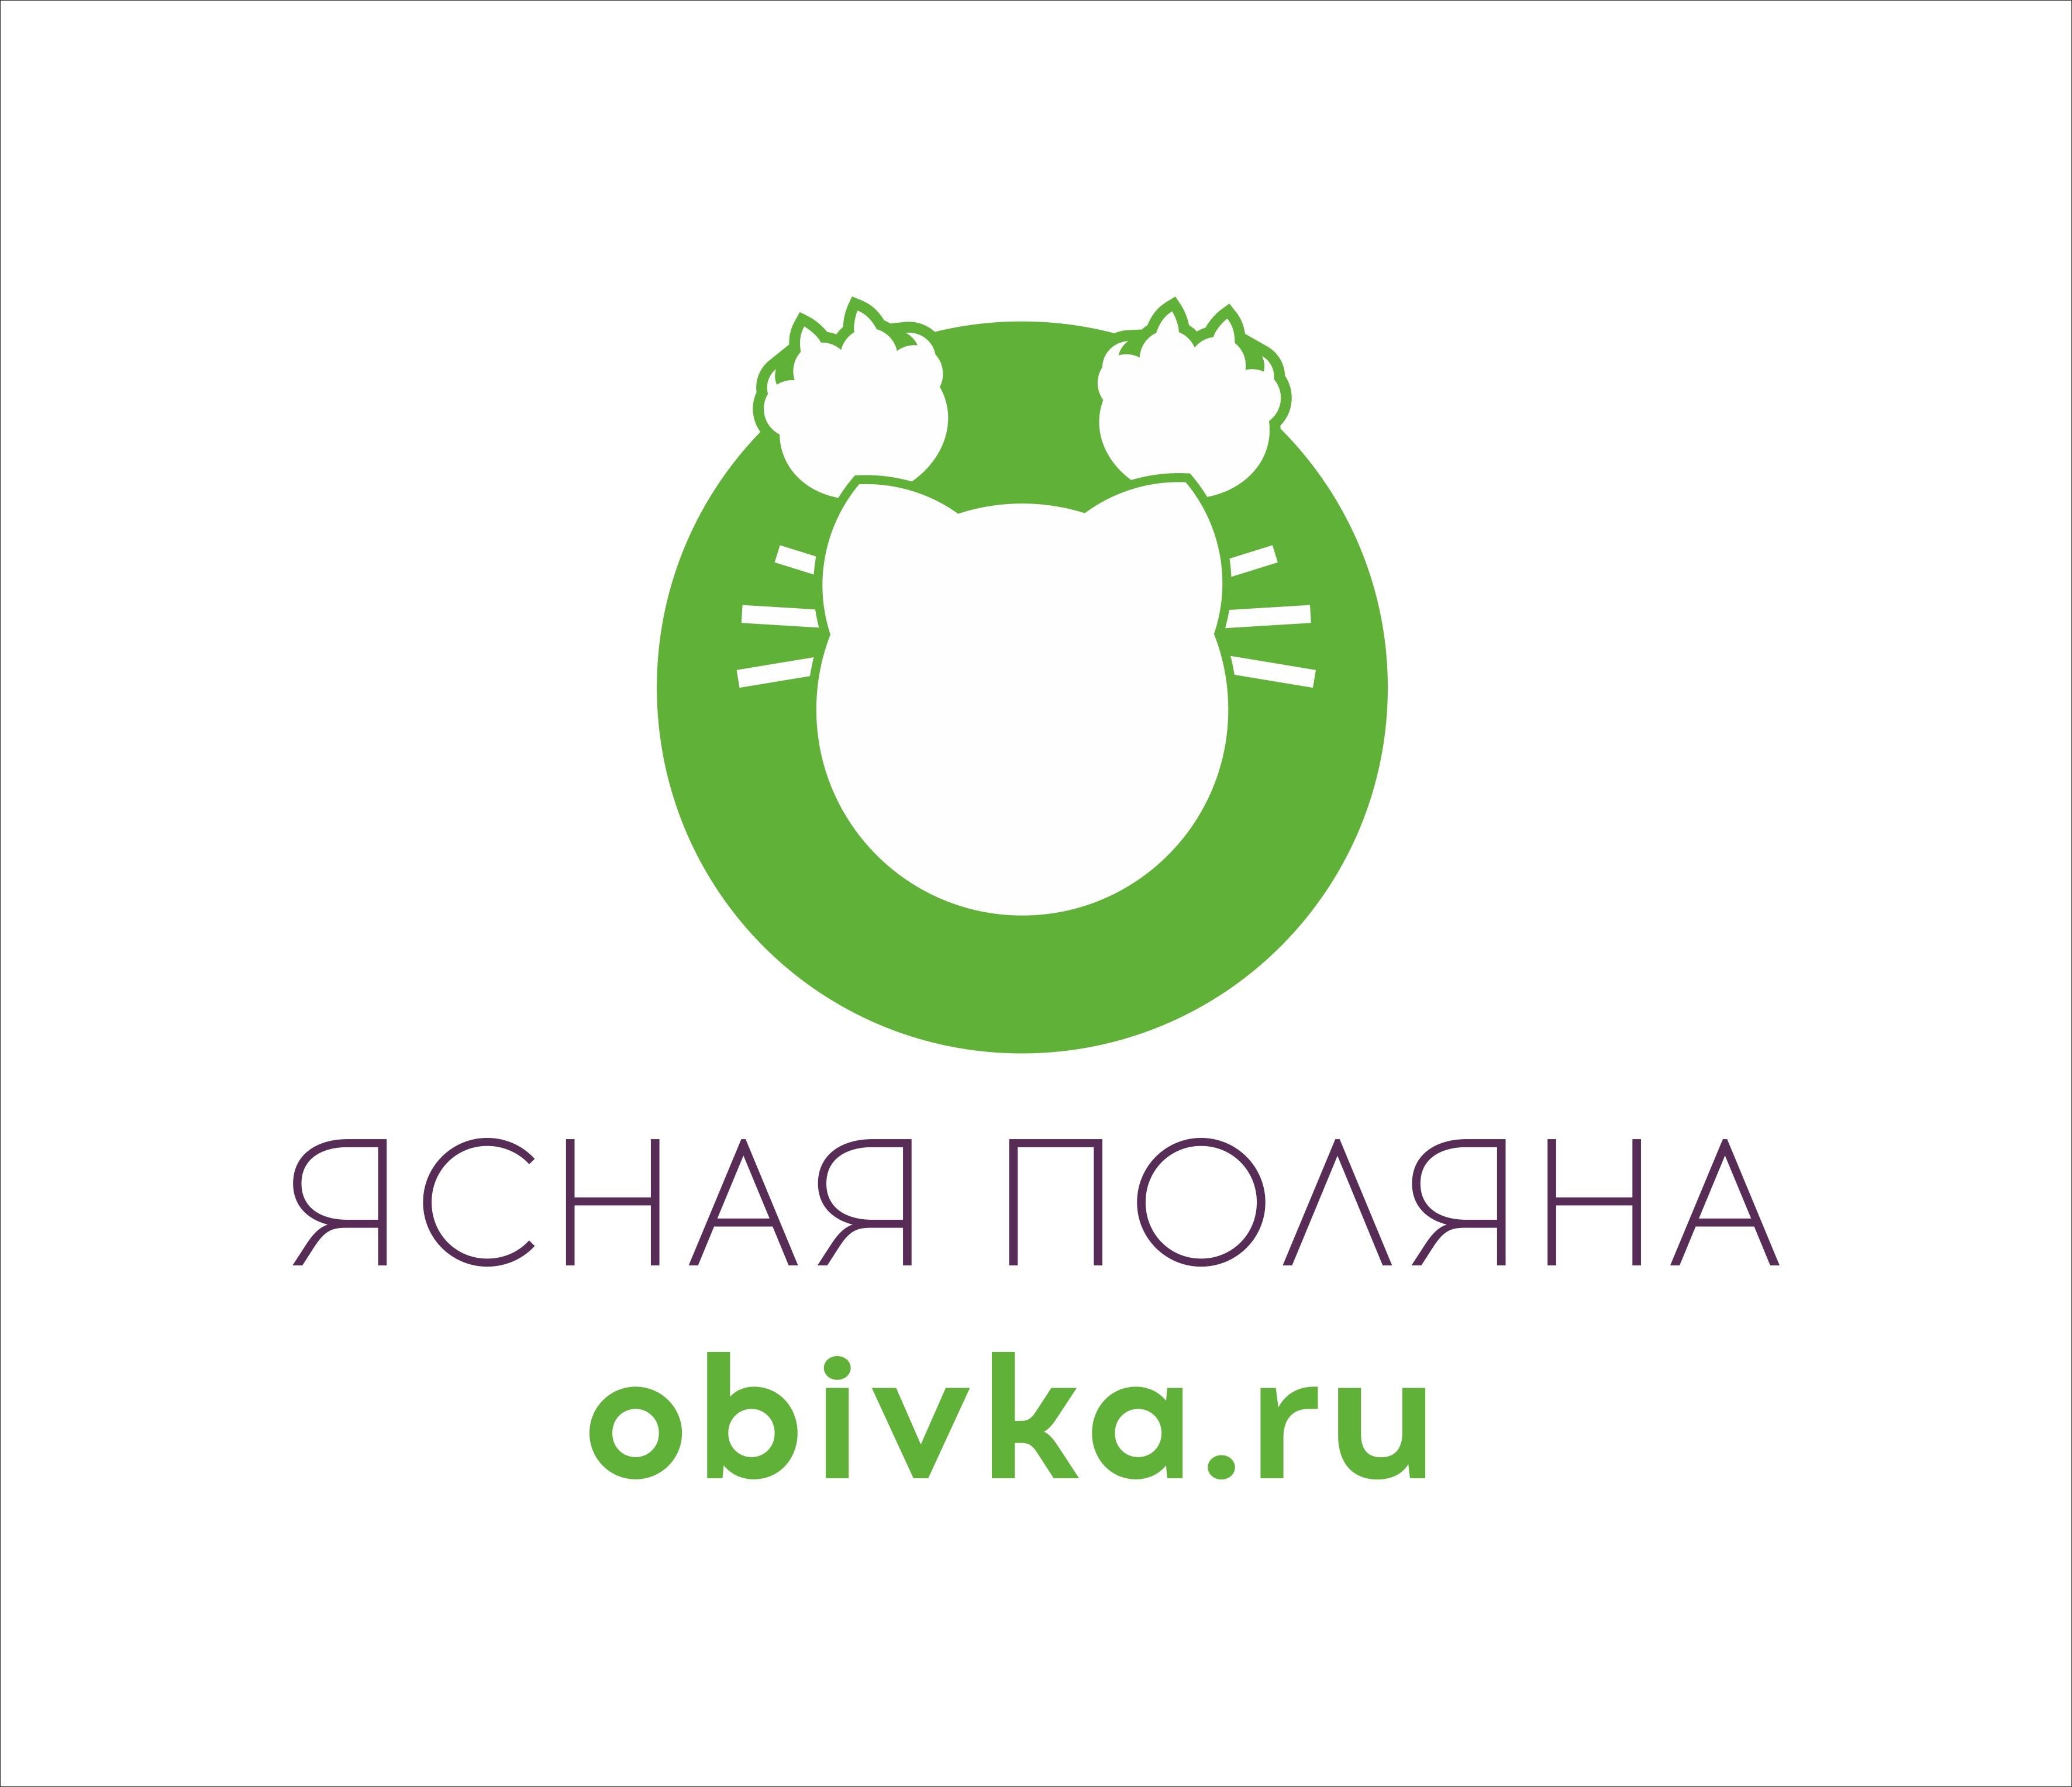 Логотип для сайта OBIVKA.RU фото f_8815c1aba3b8f812.jpg